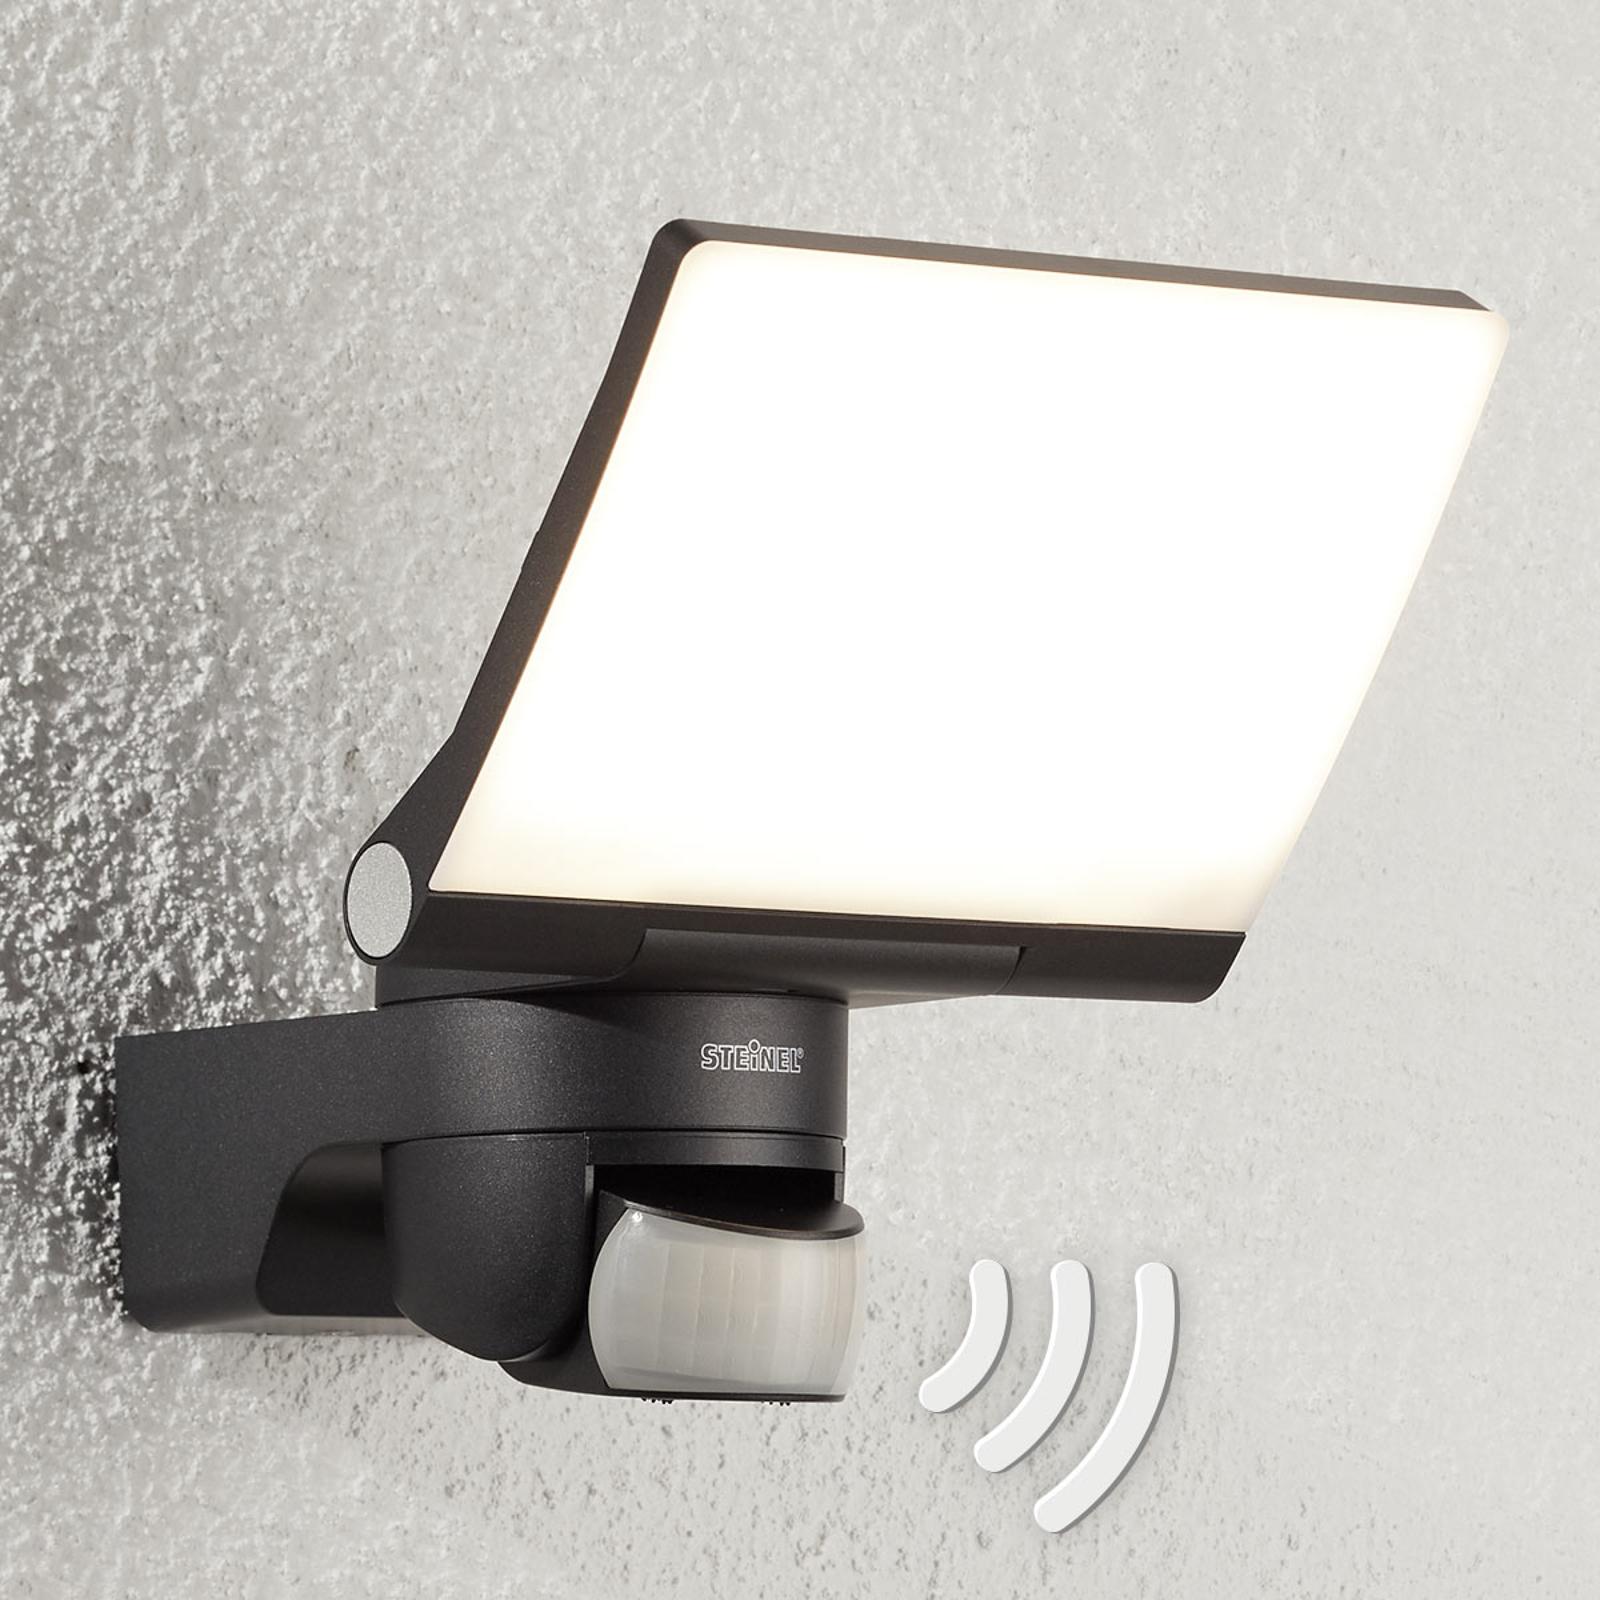 STEINEL XLED Home 2 XL senzor světlomet LED grafit